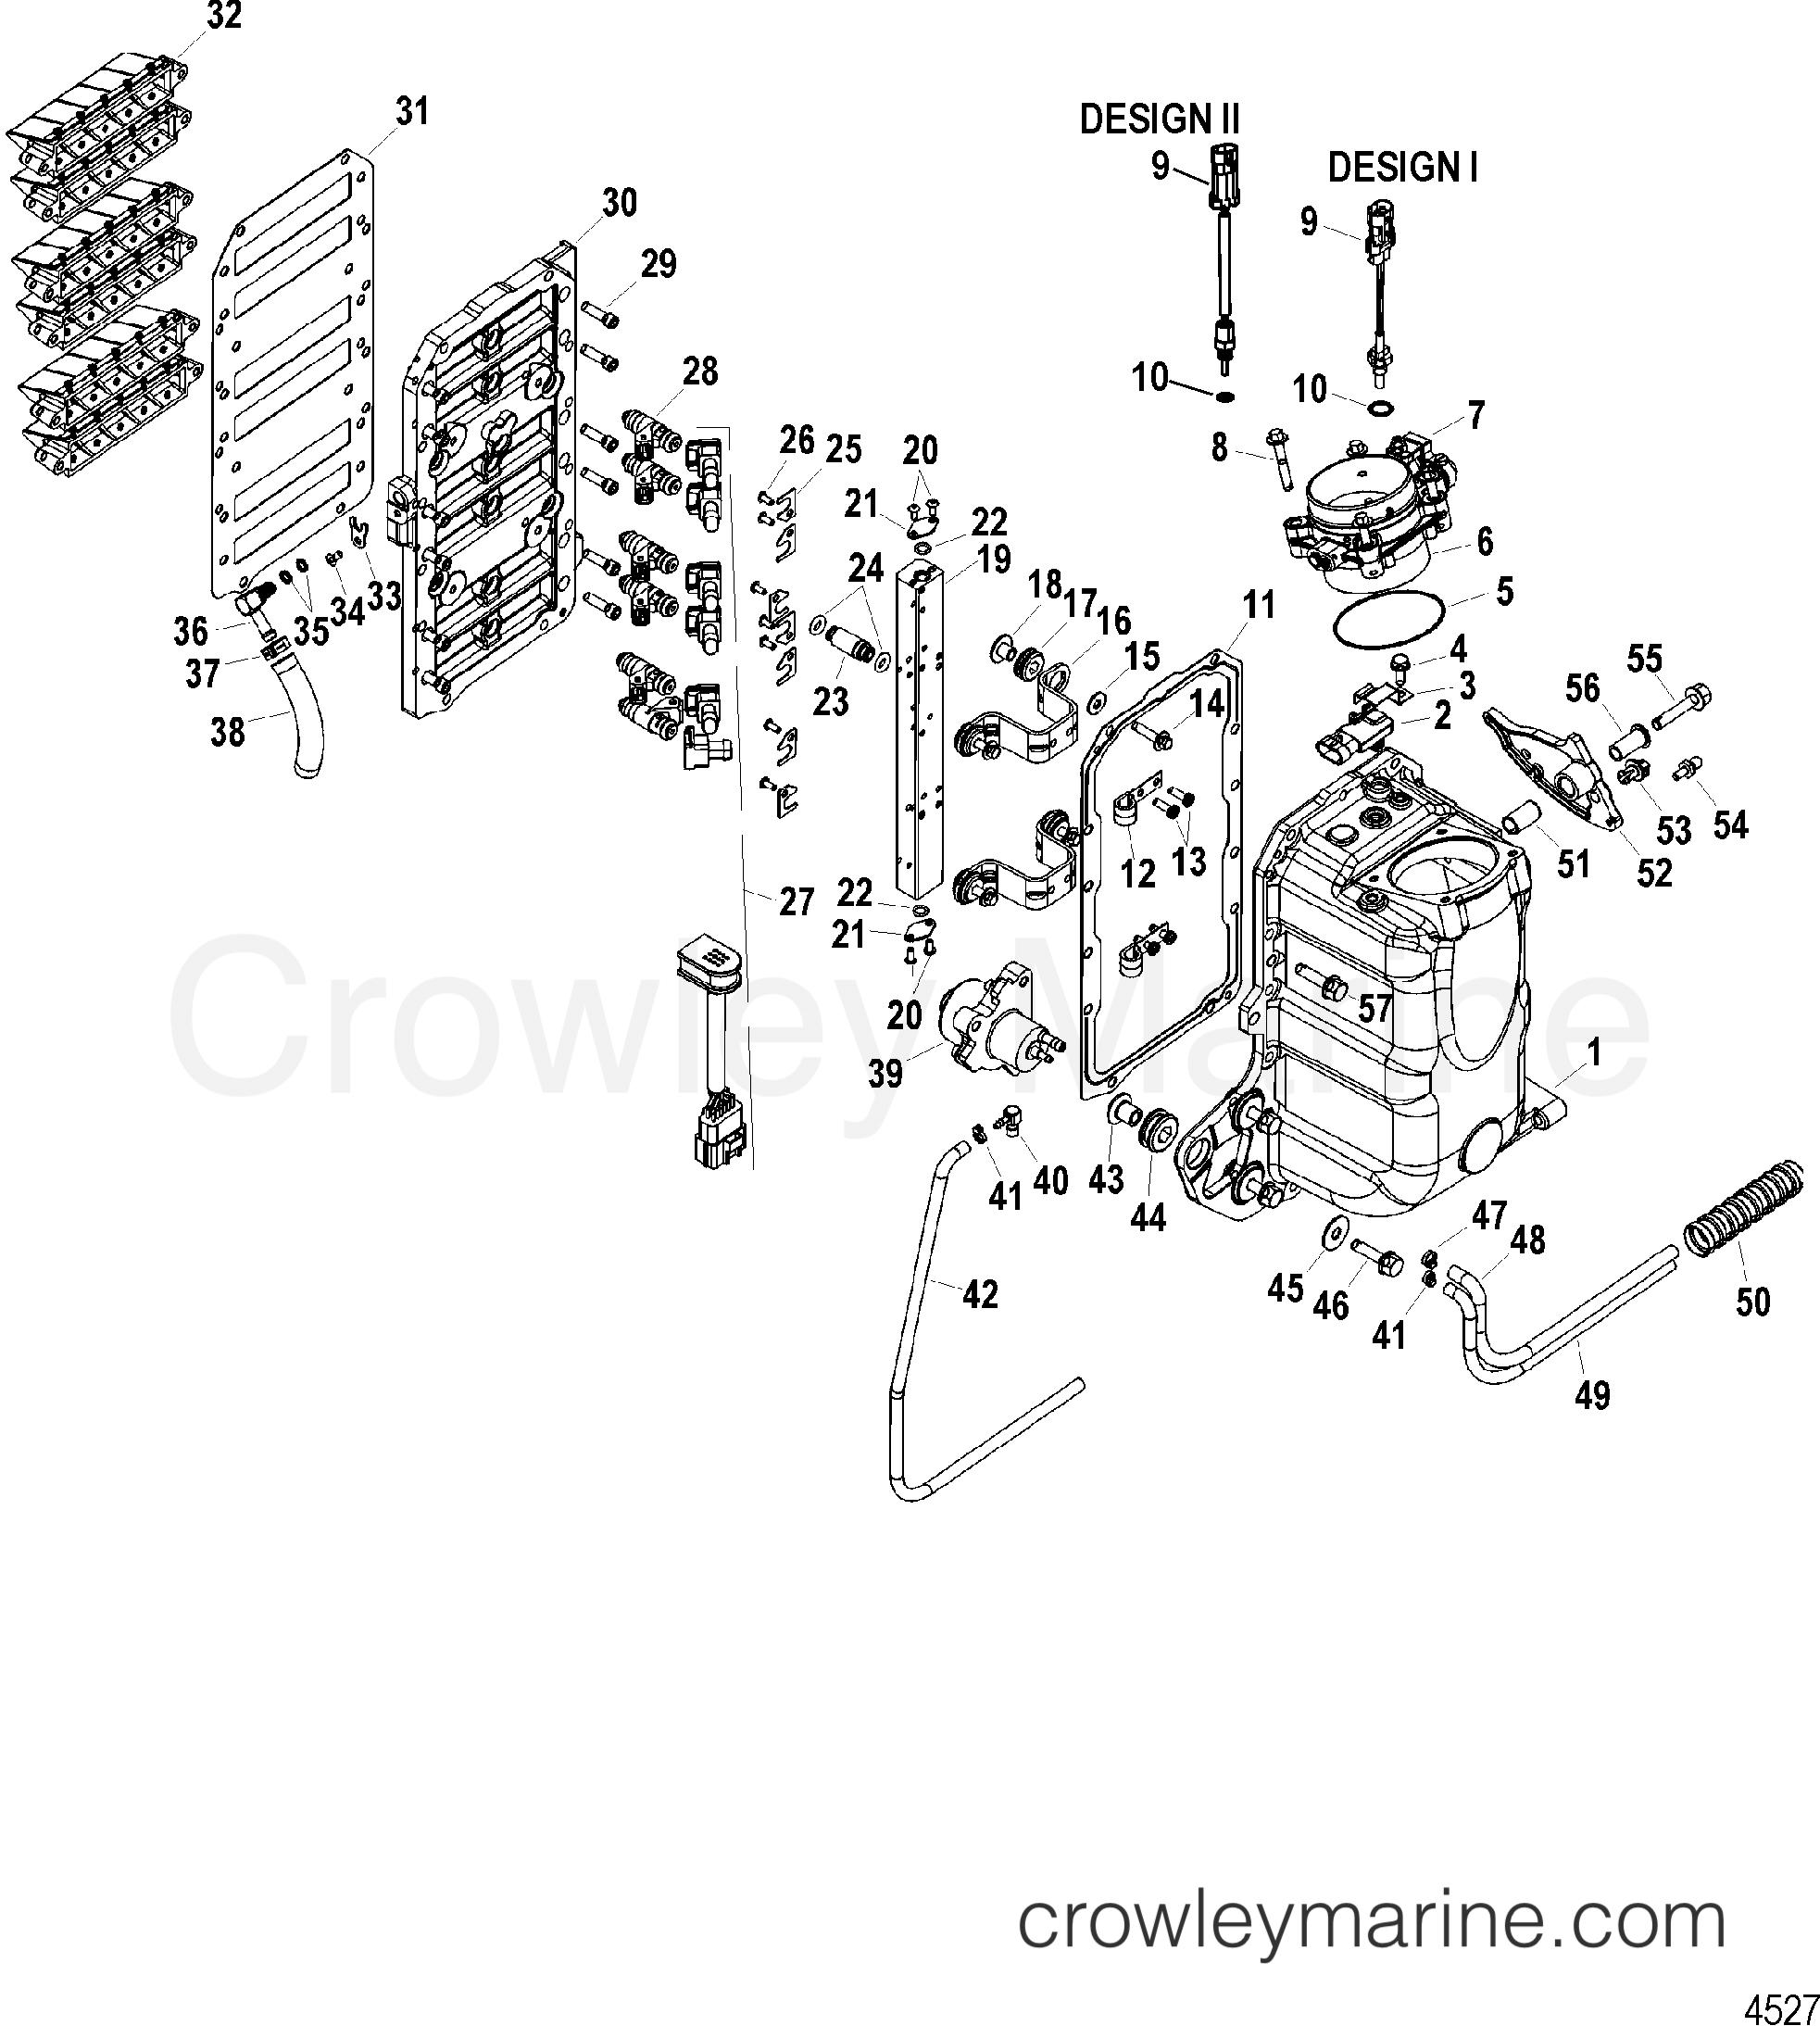 AIR HANDLER AND FUEL RAIL COMPONENTS - 2001 SportJet 0 [M2